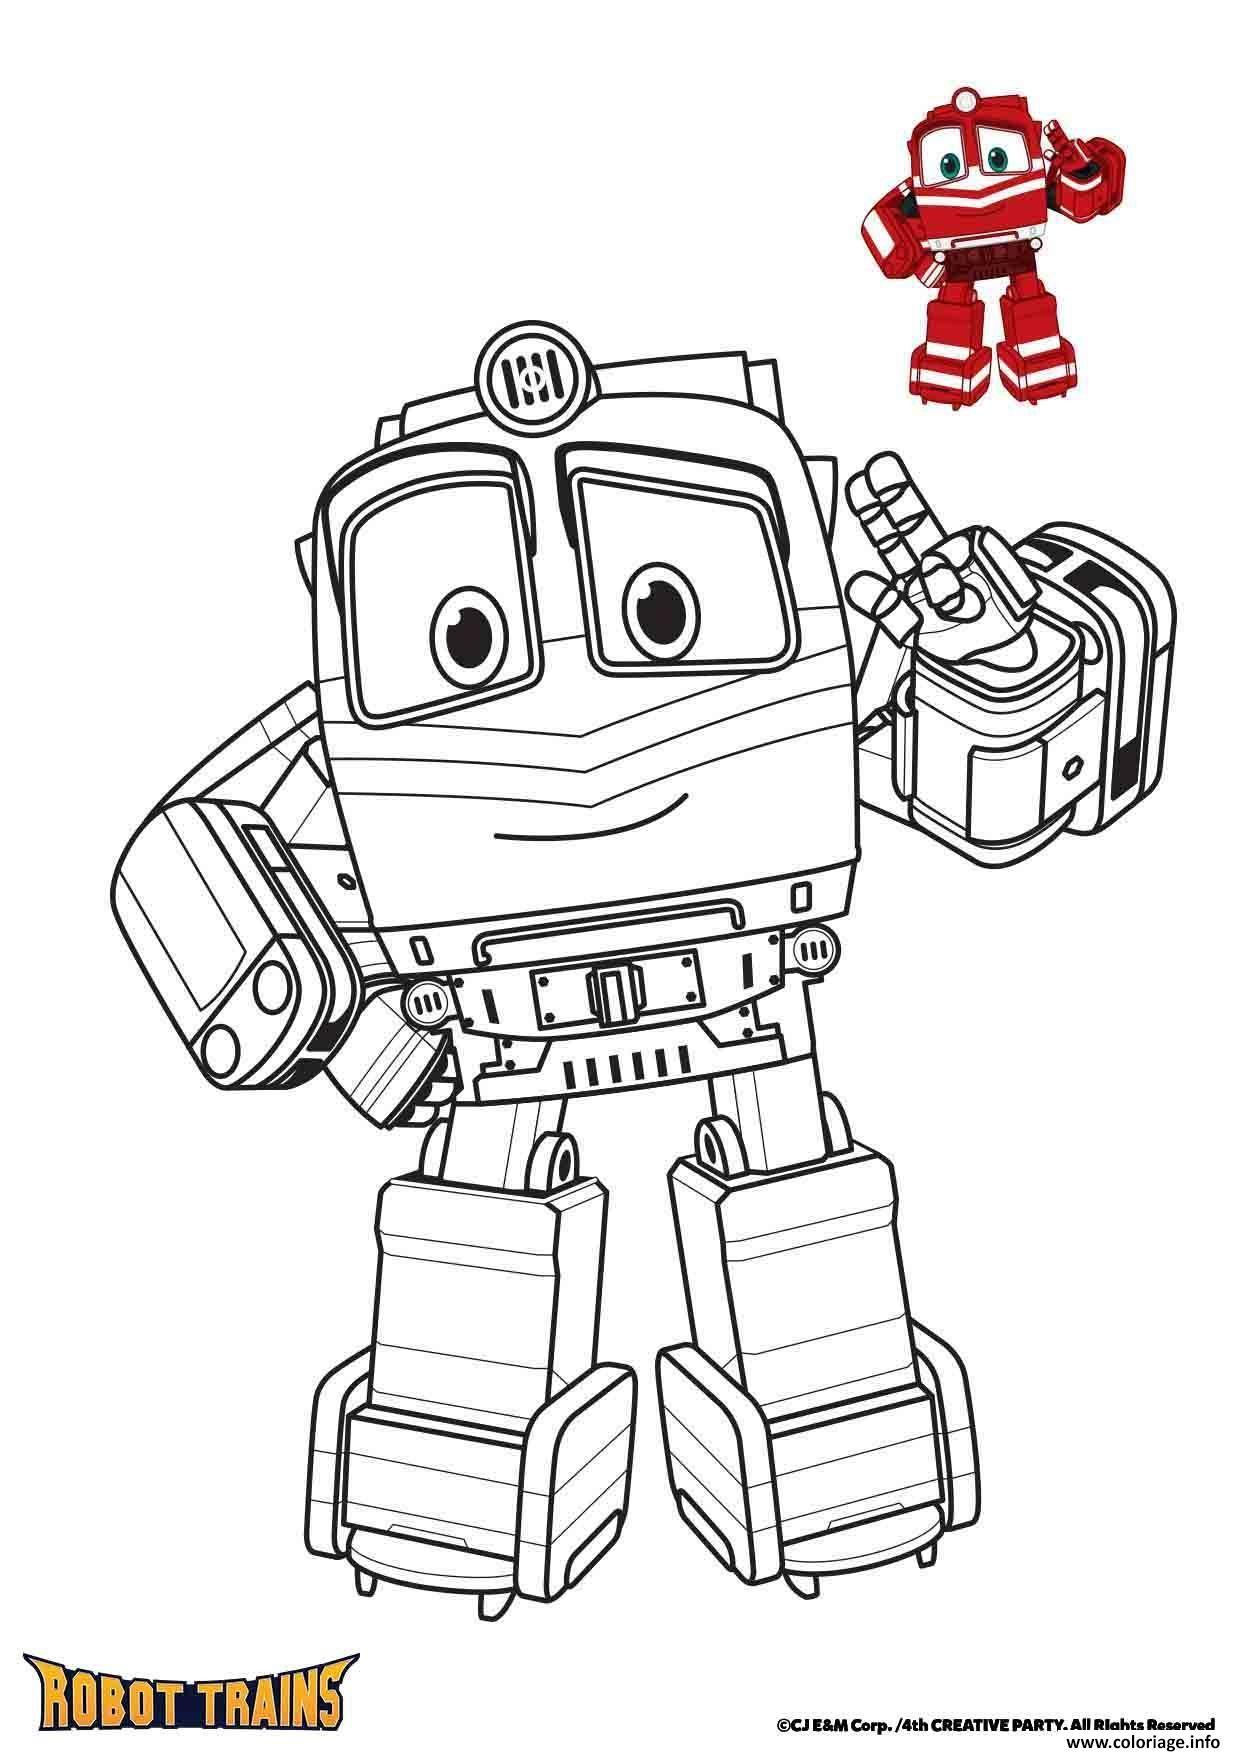 Coloriage Alf Robot Trains dessin